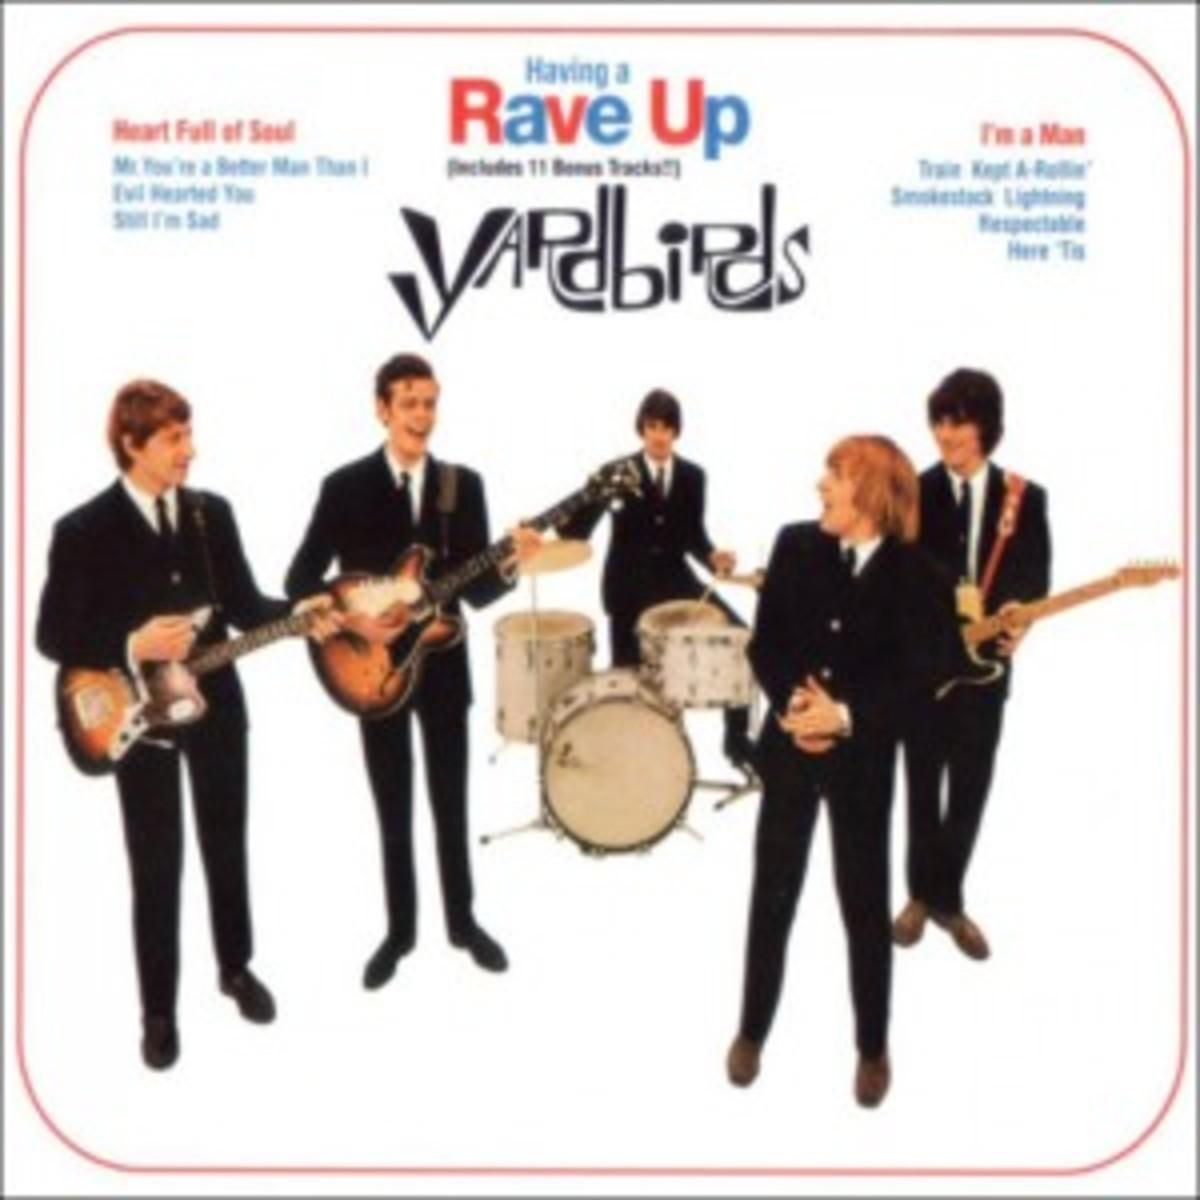 yardbirds-having-a-rave-up